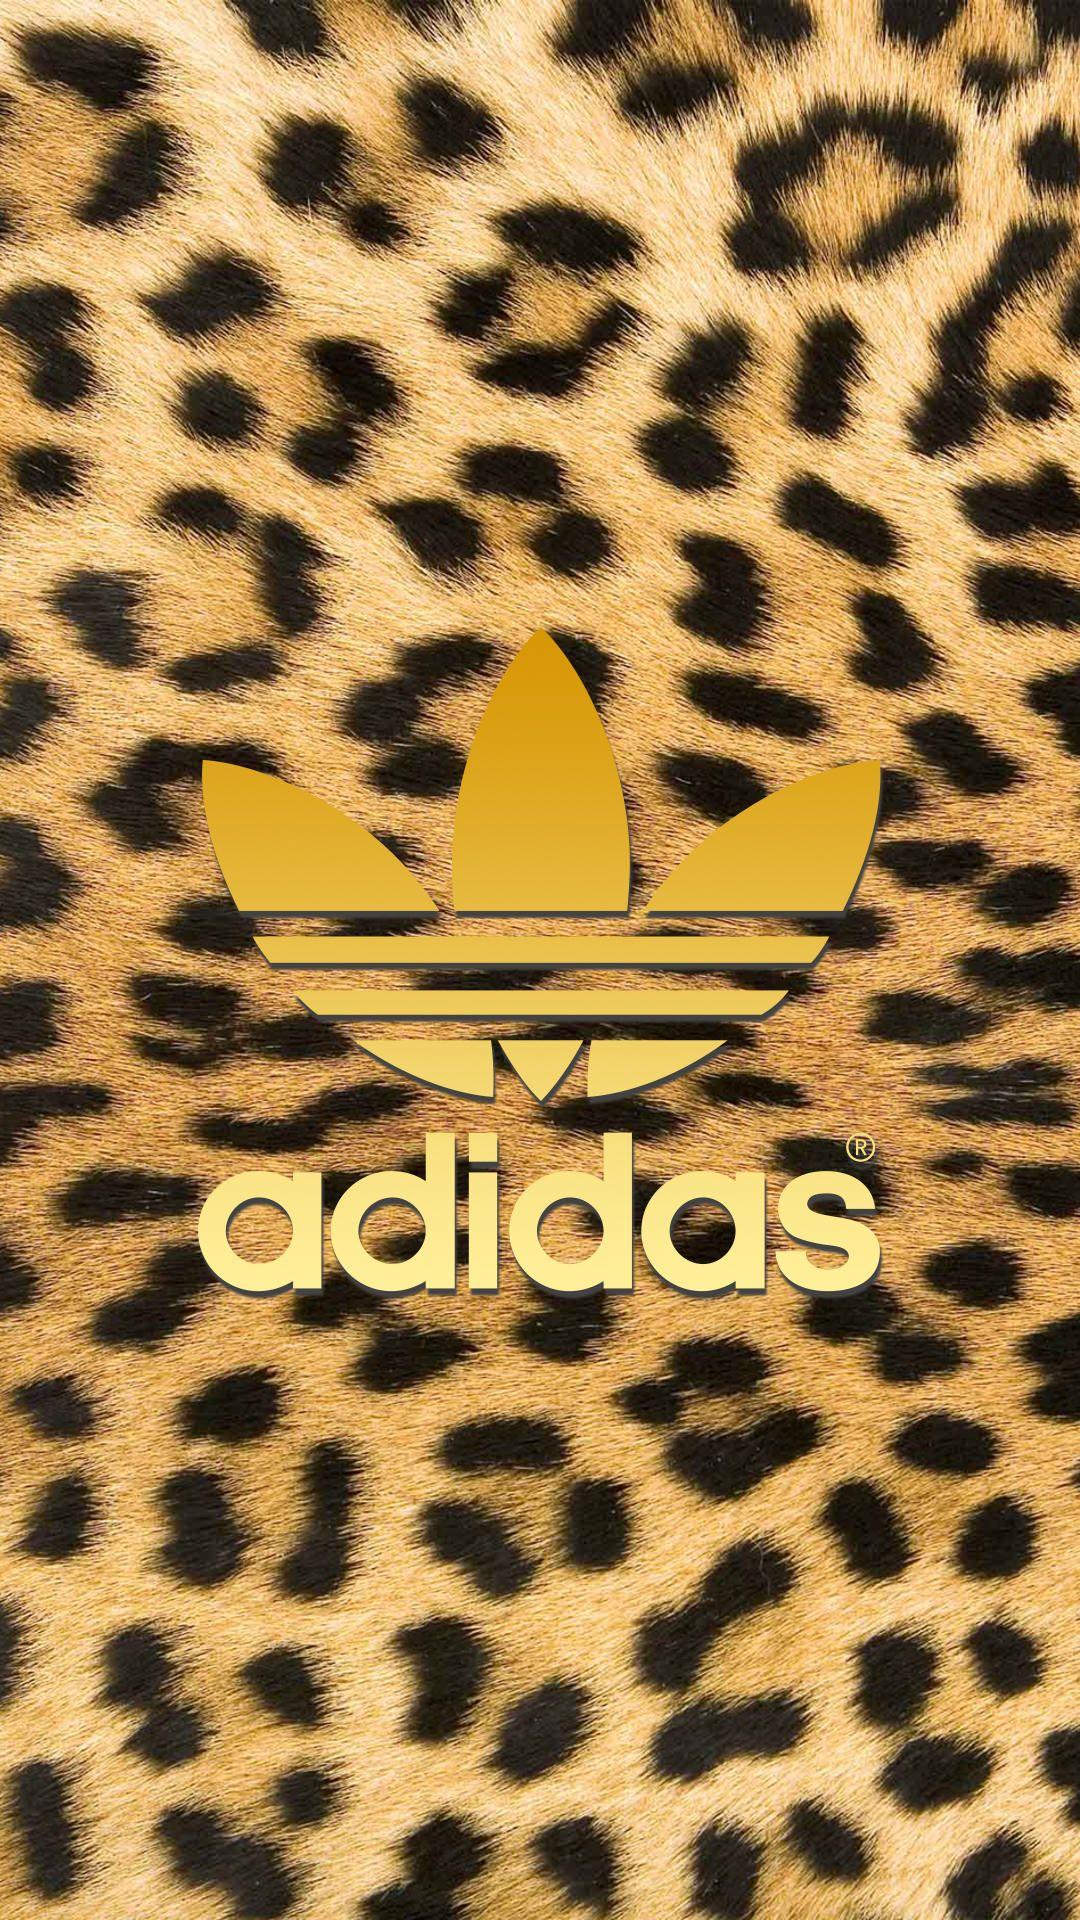 Adidas アディダス の高画質スマホ壁紙25枚 壁紙の背景 携帯電話の壁紙 アディダス